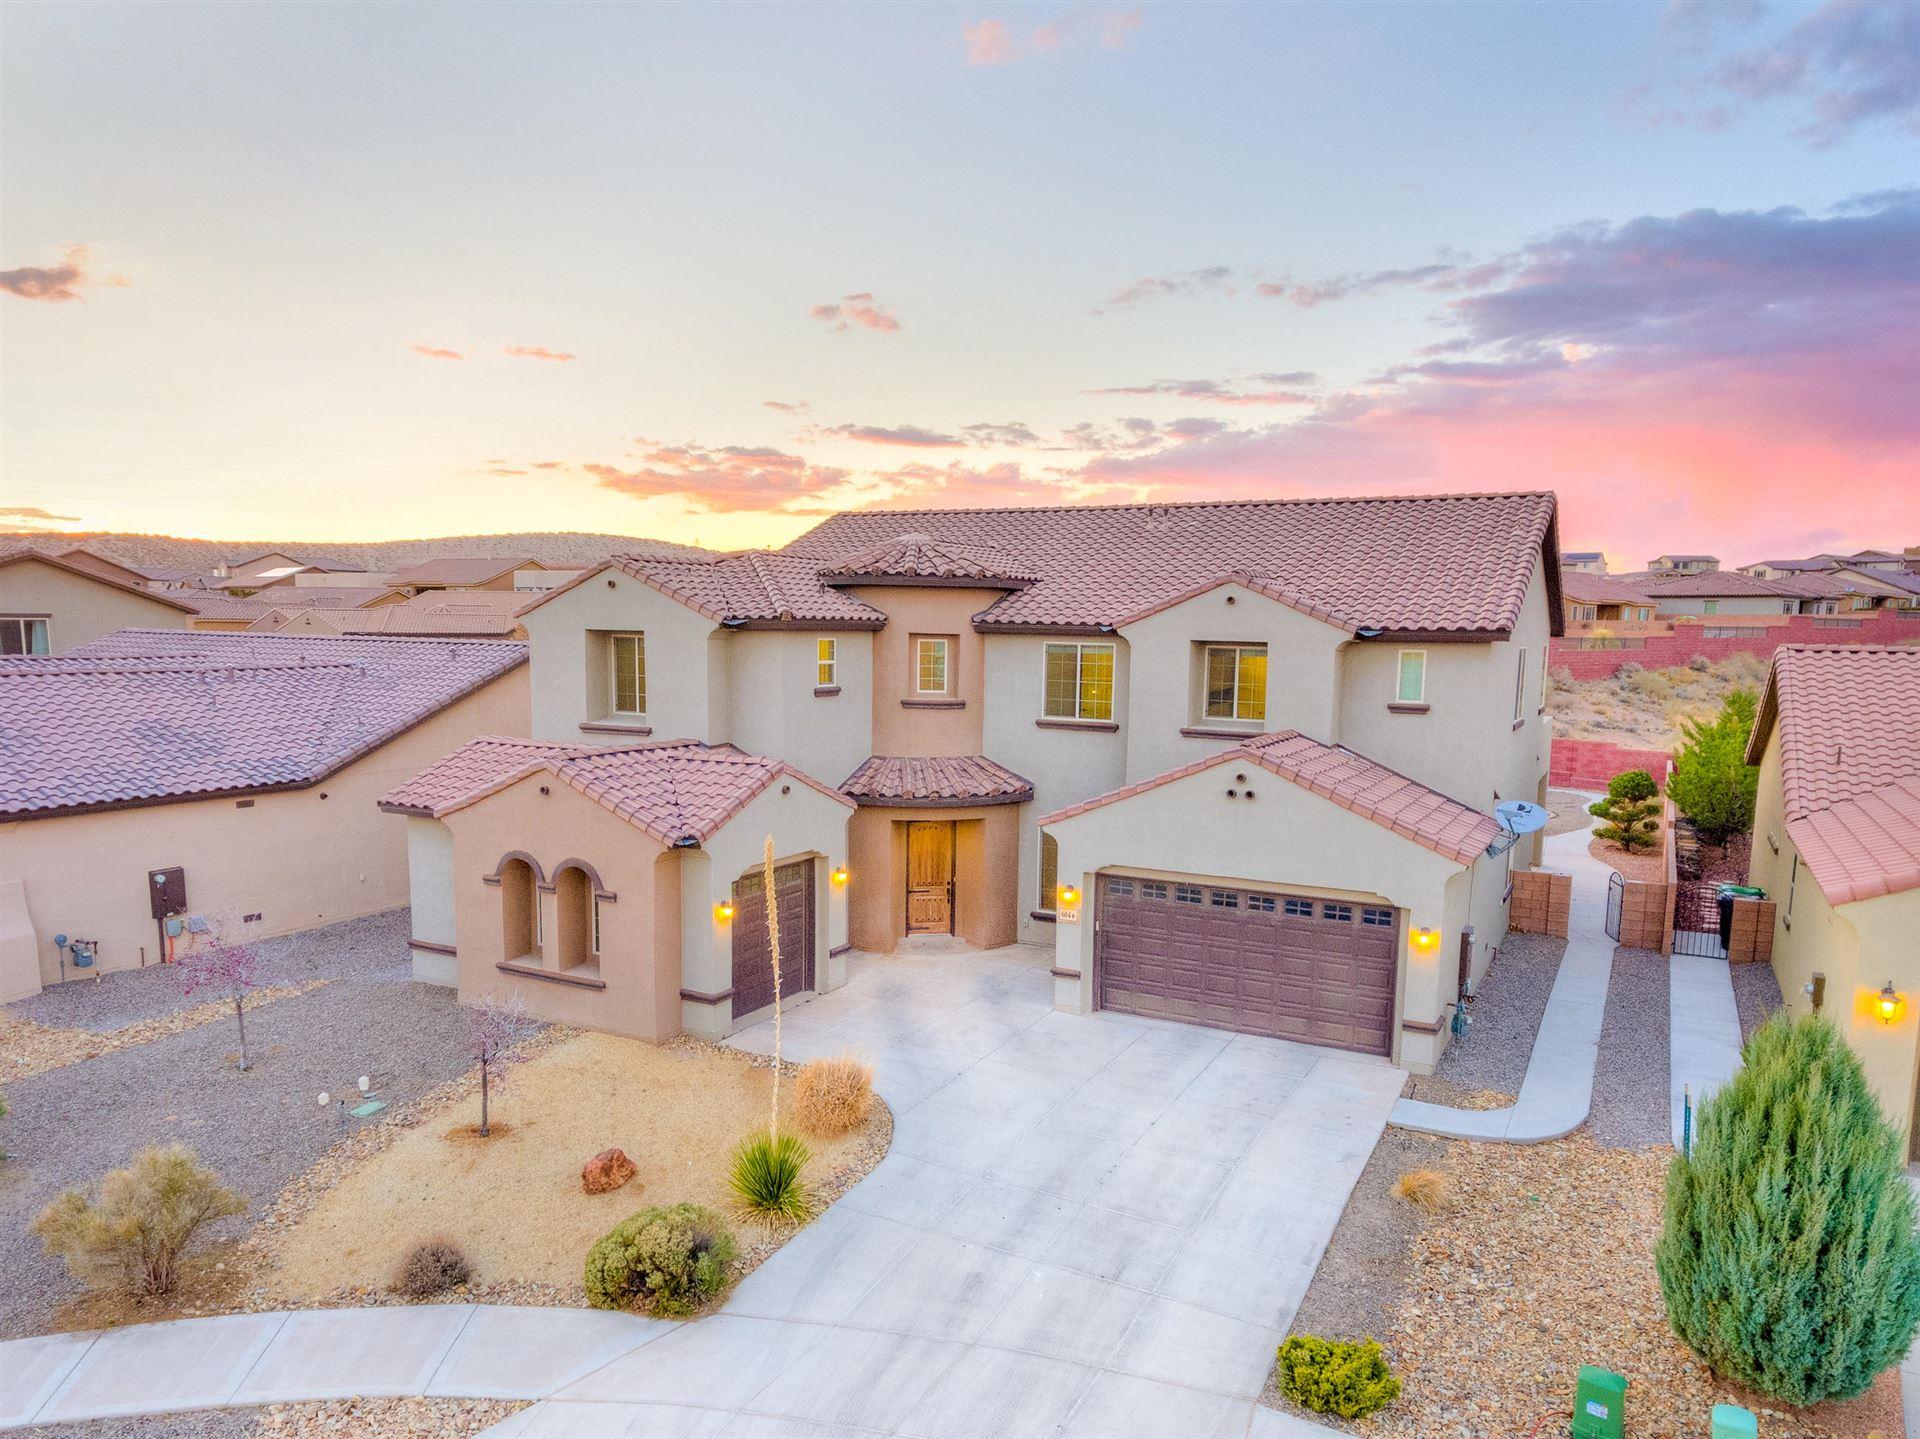 604 Sierra Verde Way NE, Rio Rancho, NM 87124 - #: 989147